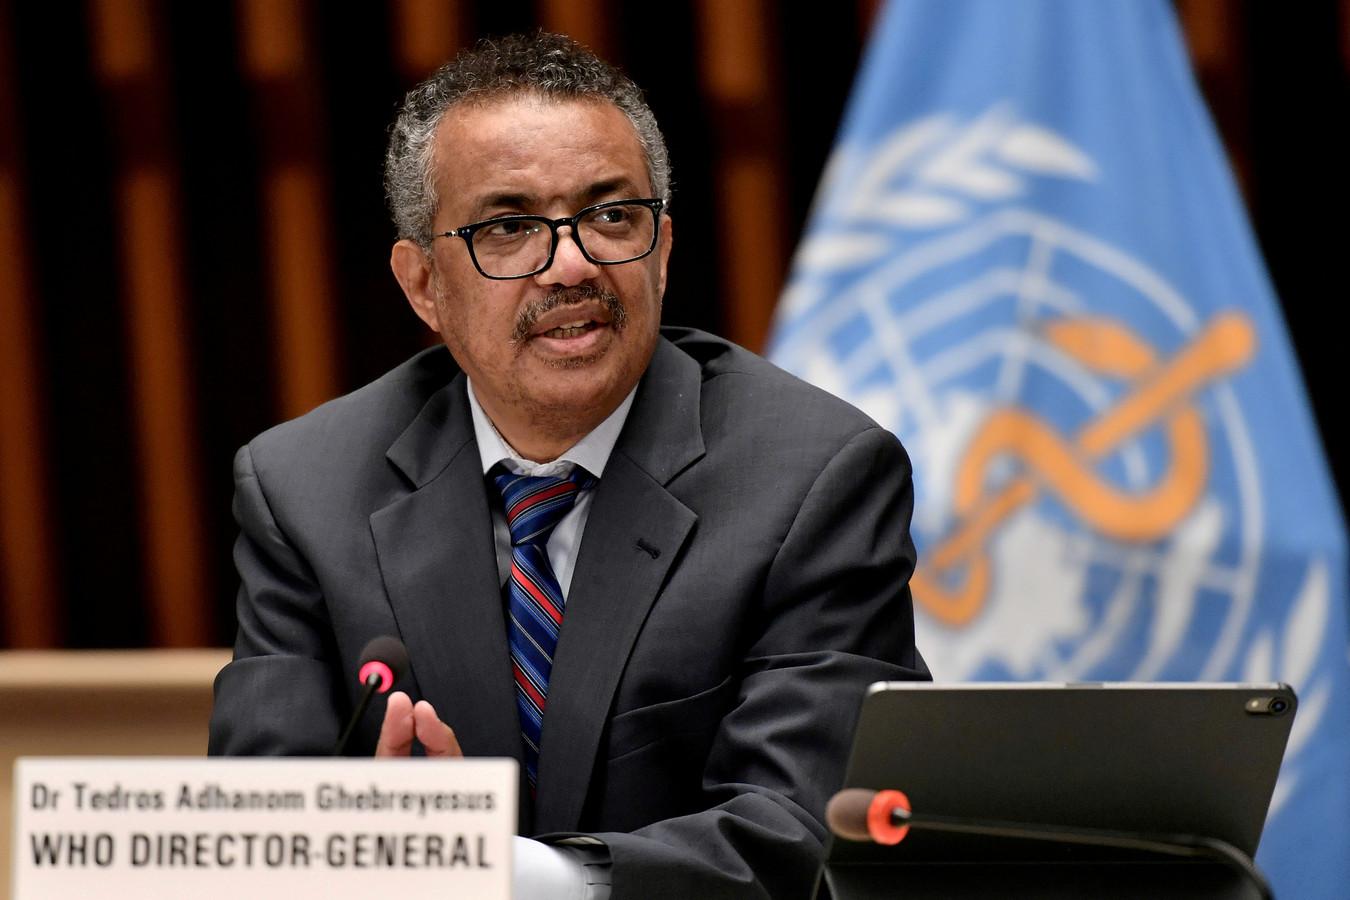 Tedros Adhanom Ghebreyesus, directeur général de l'OMS.